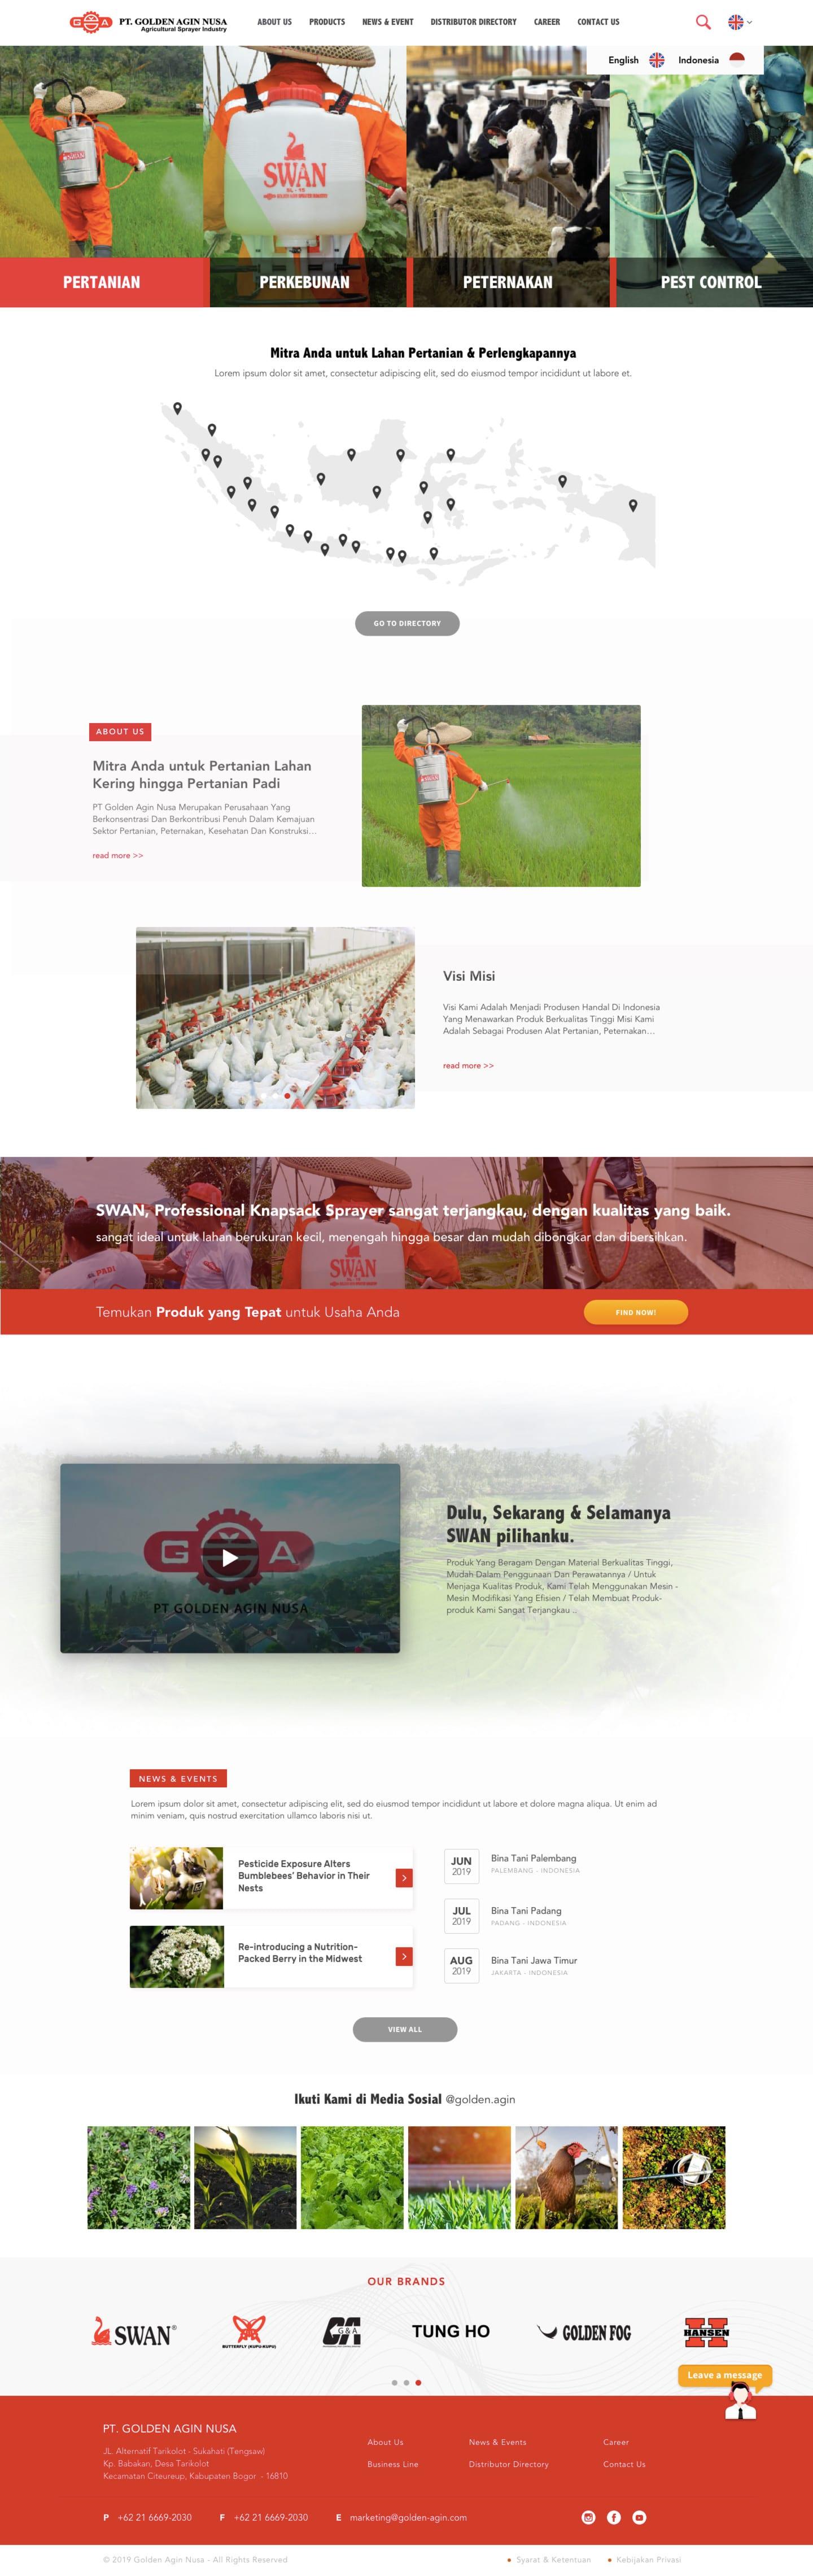 portfolio popout.id web development agency jakarta client Golden Agin Website